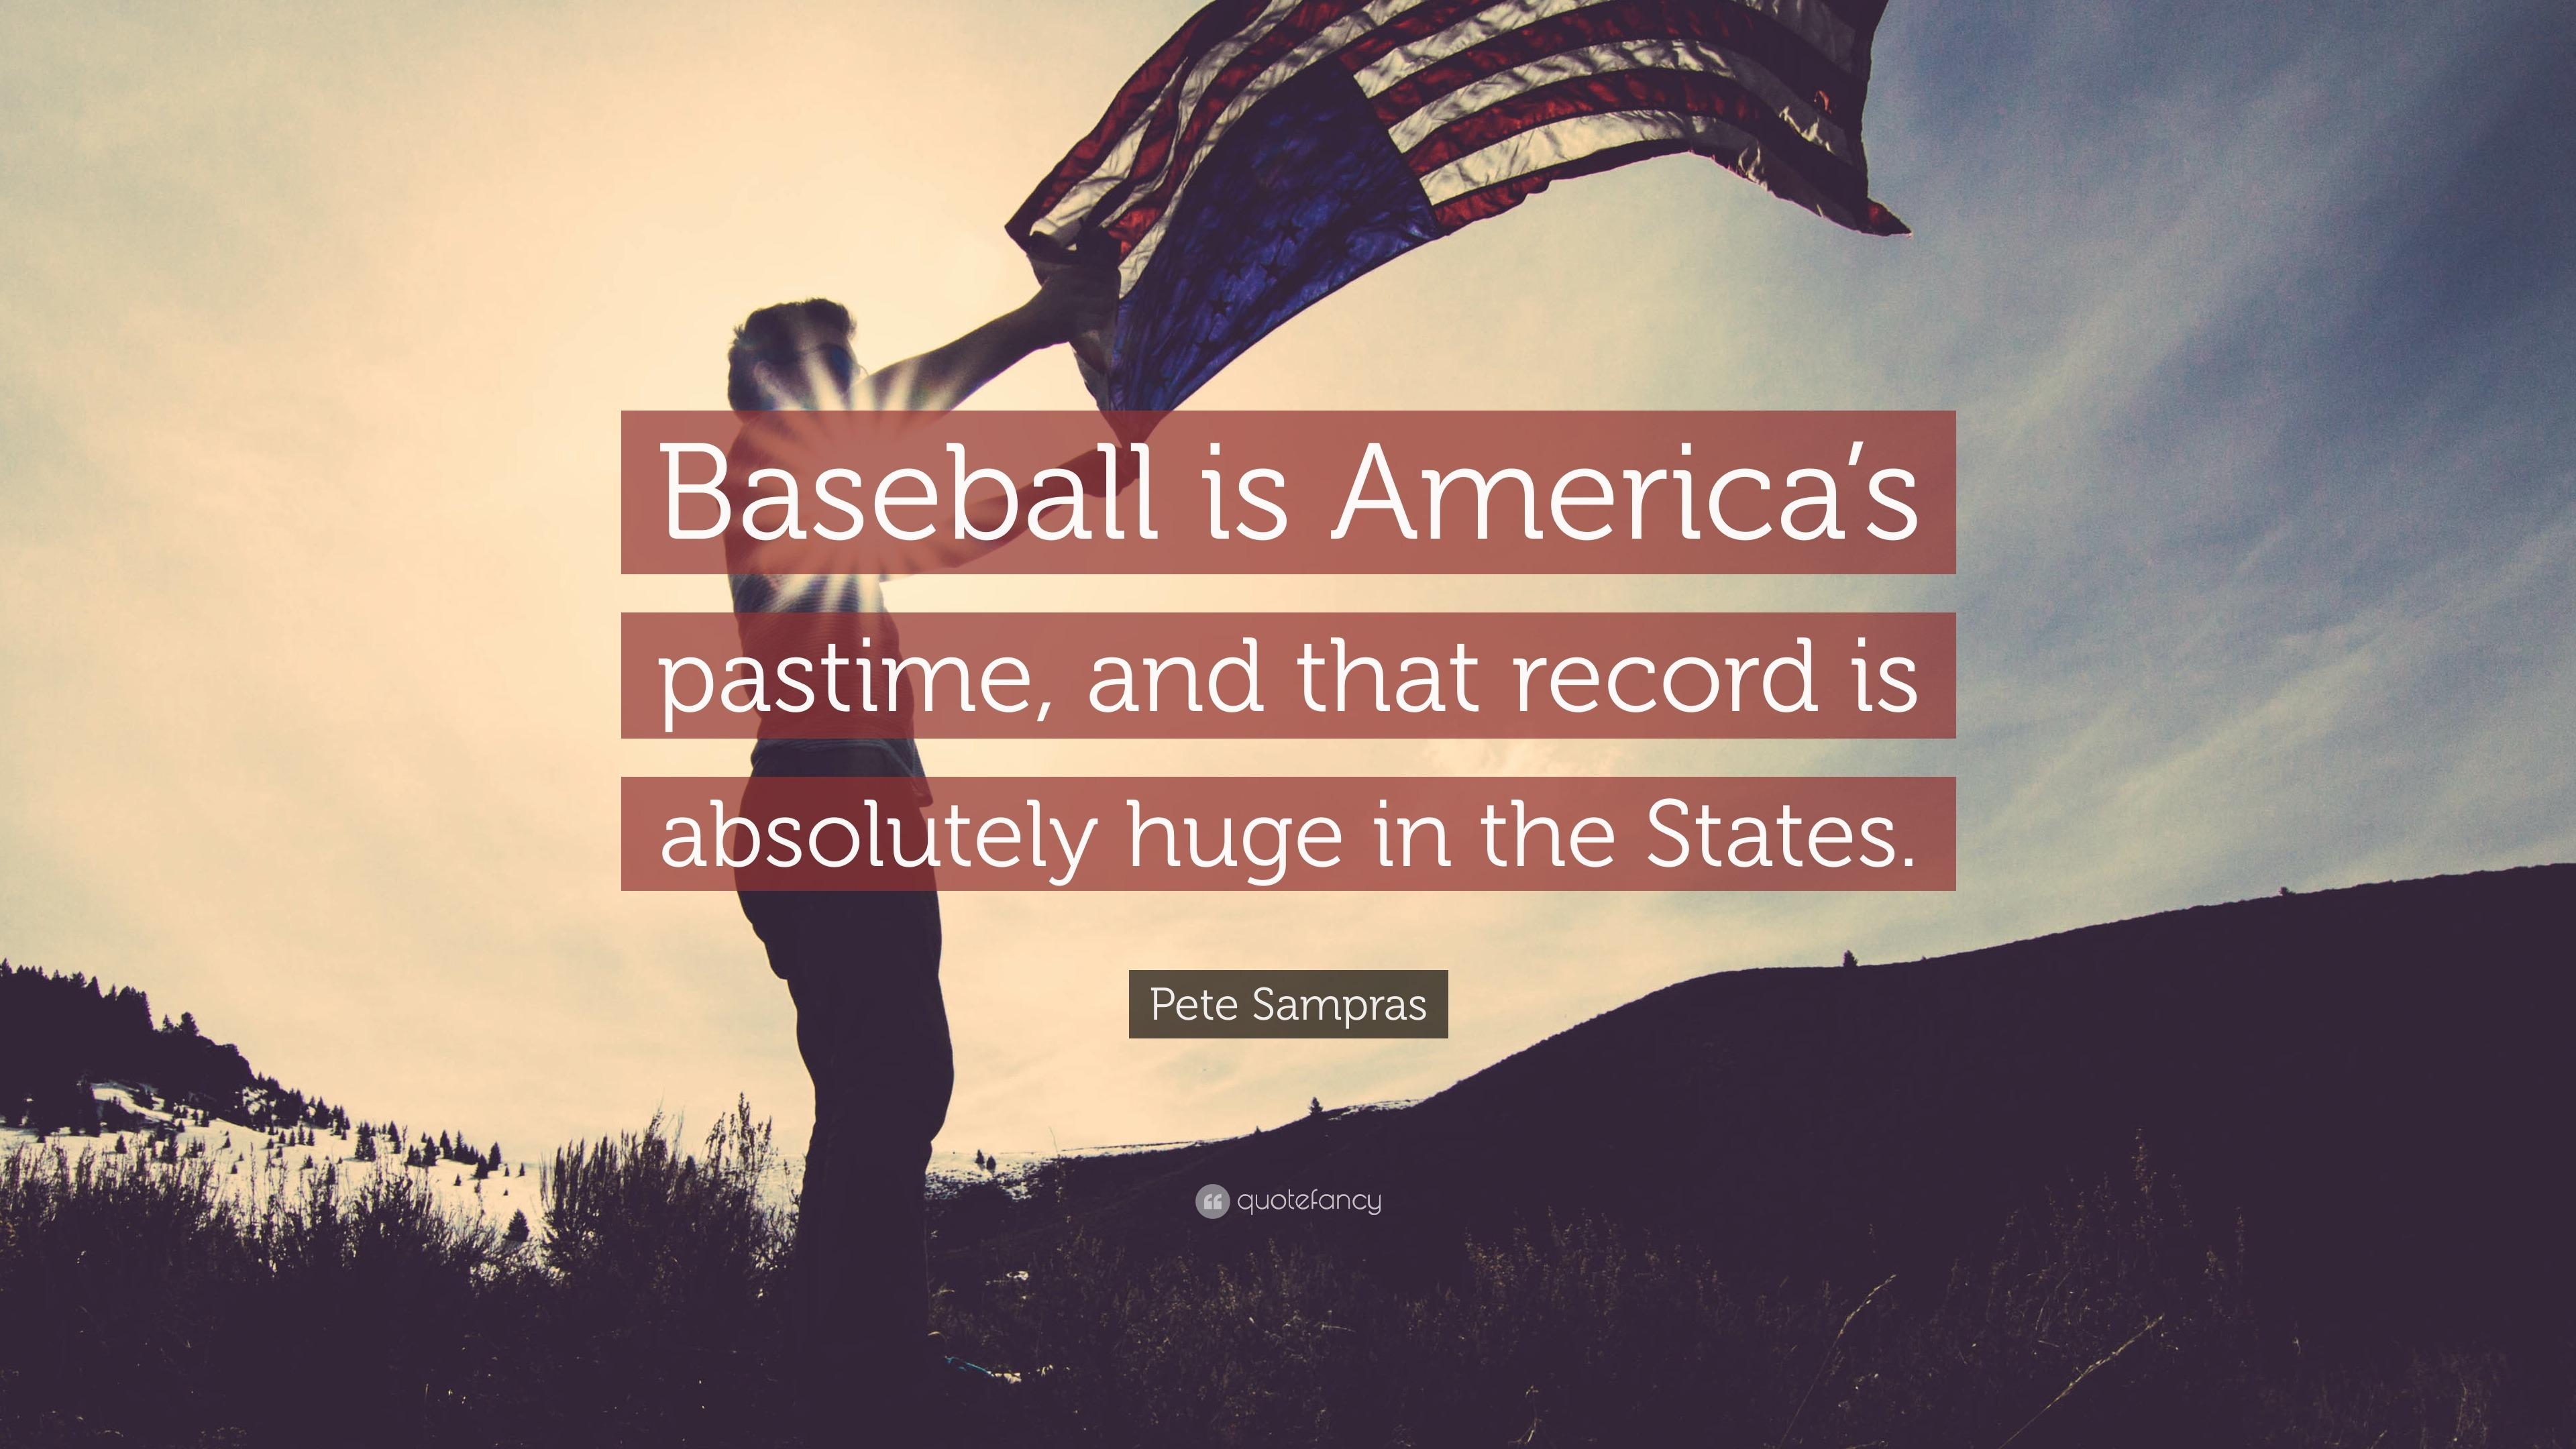 Origins of baseball